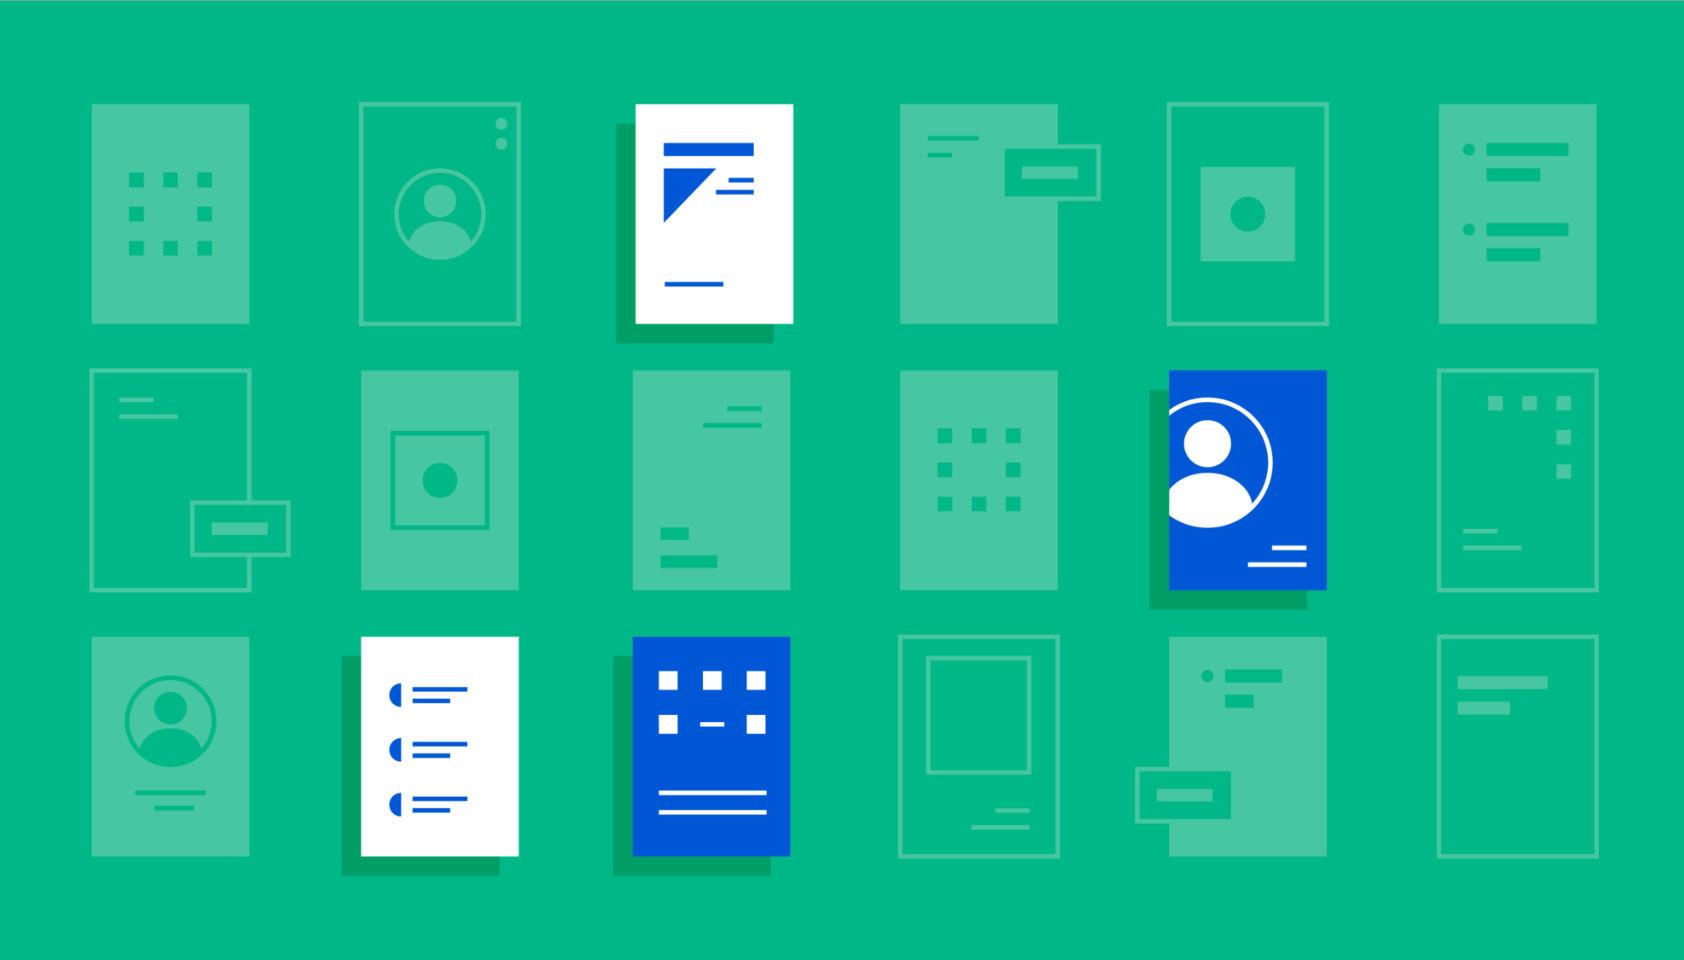 Popular Design News of the Week: April 20, 2020 – April 26, 2020